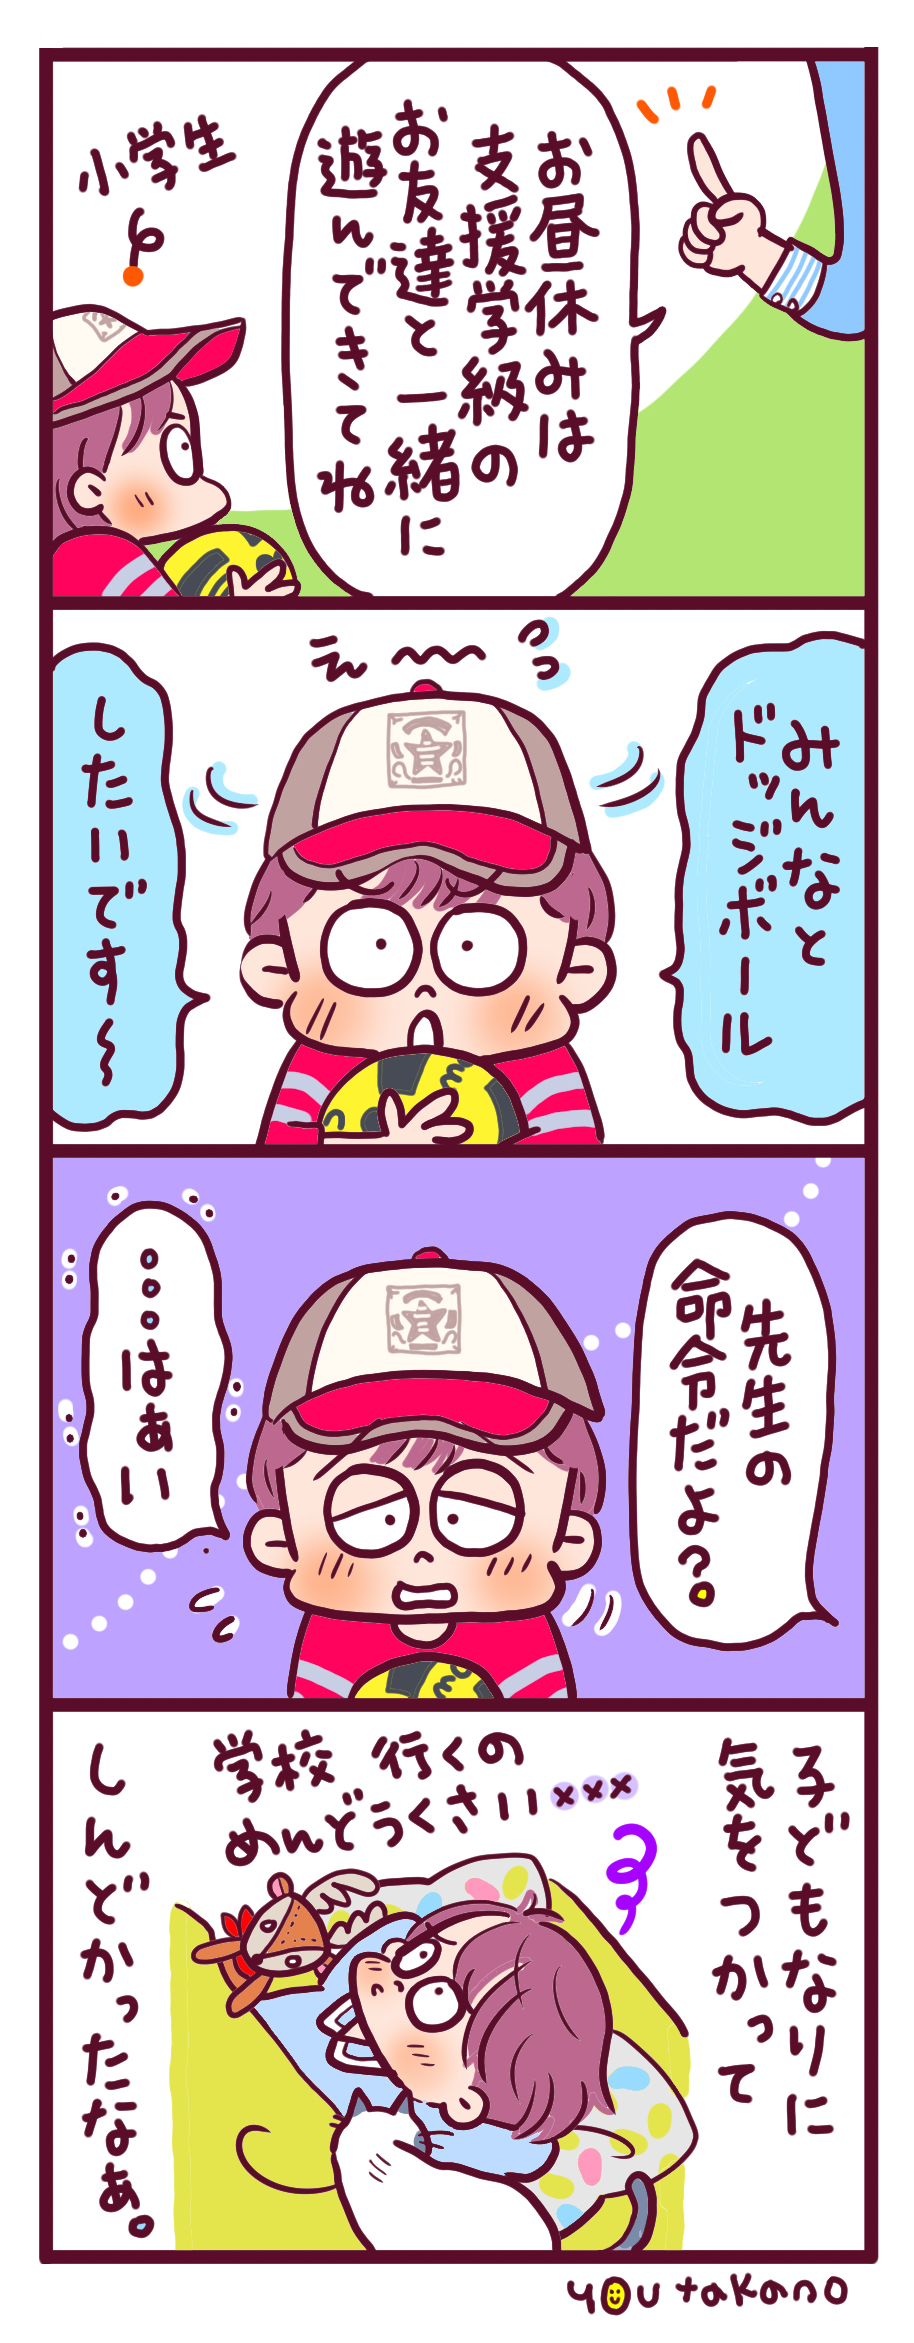 HSP3(高野優)